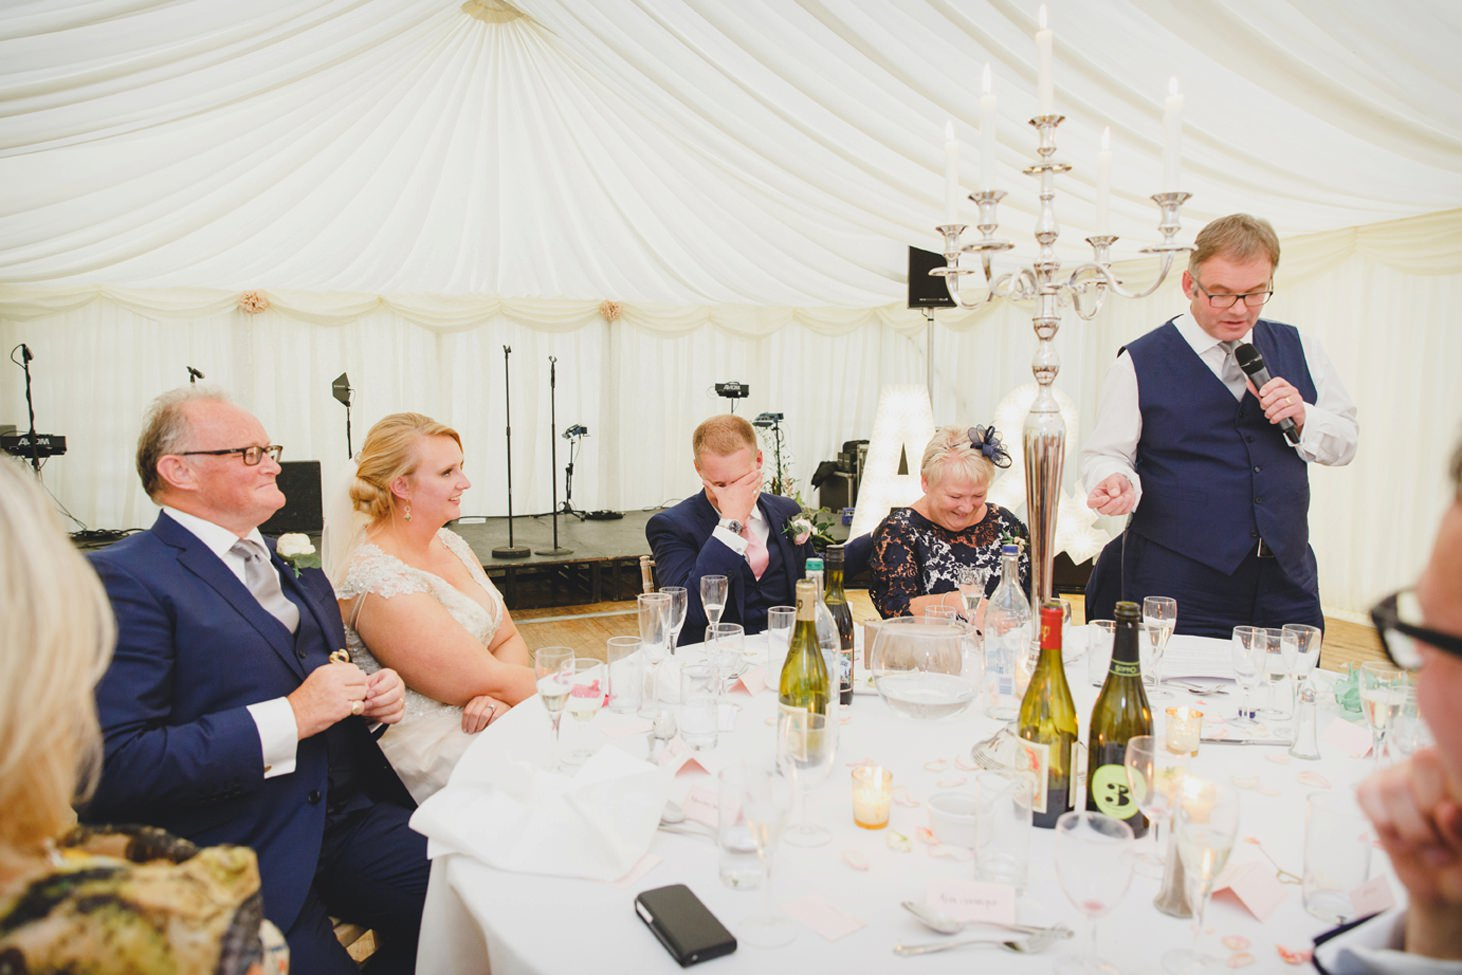 oxfordshire wedding photography best man speech